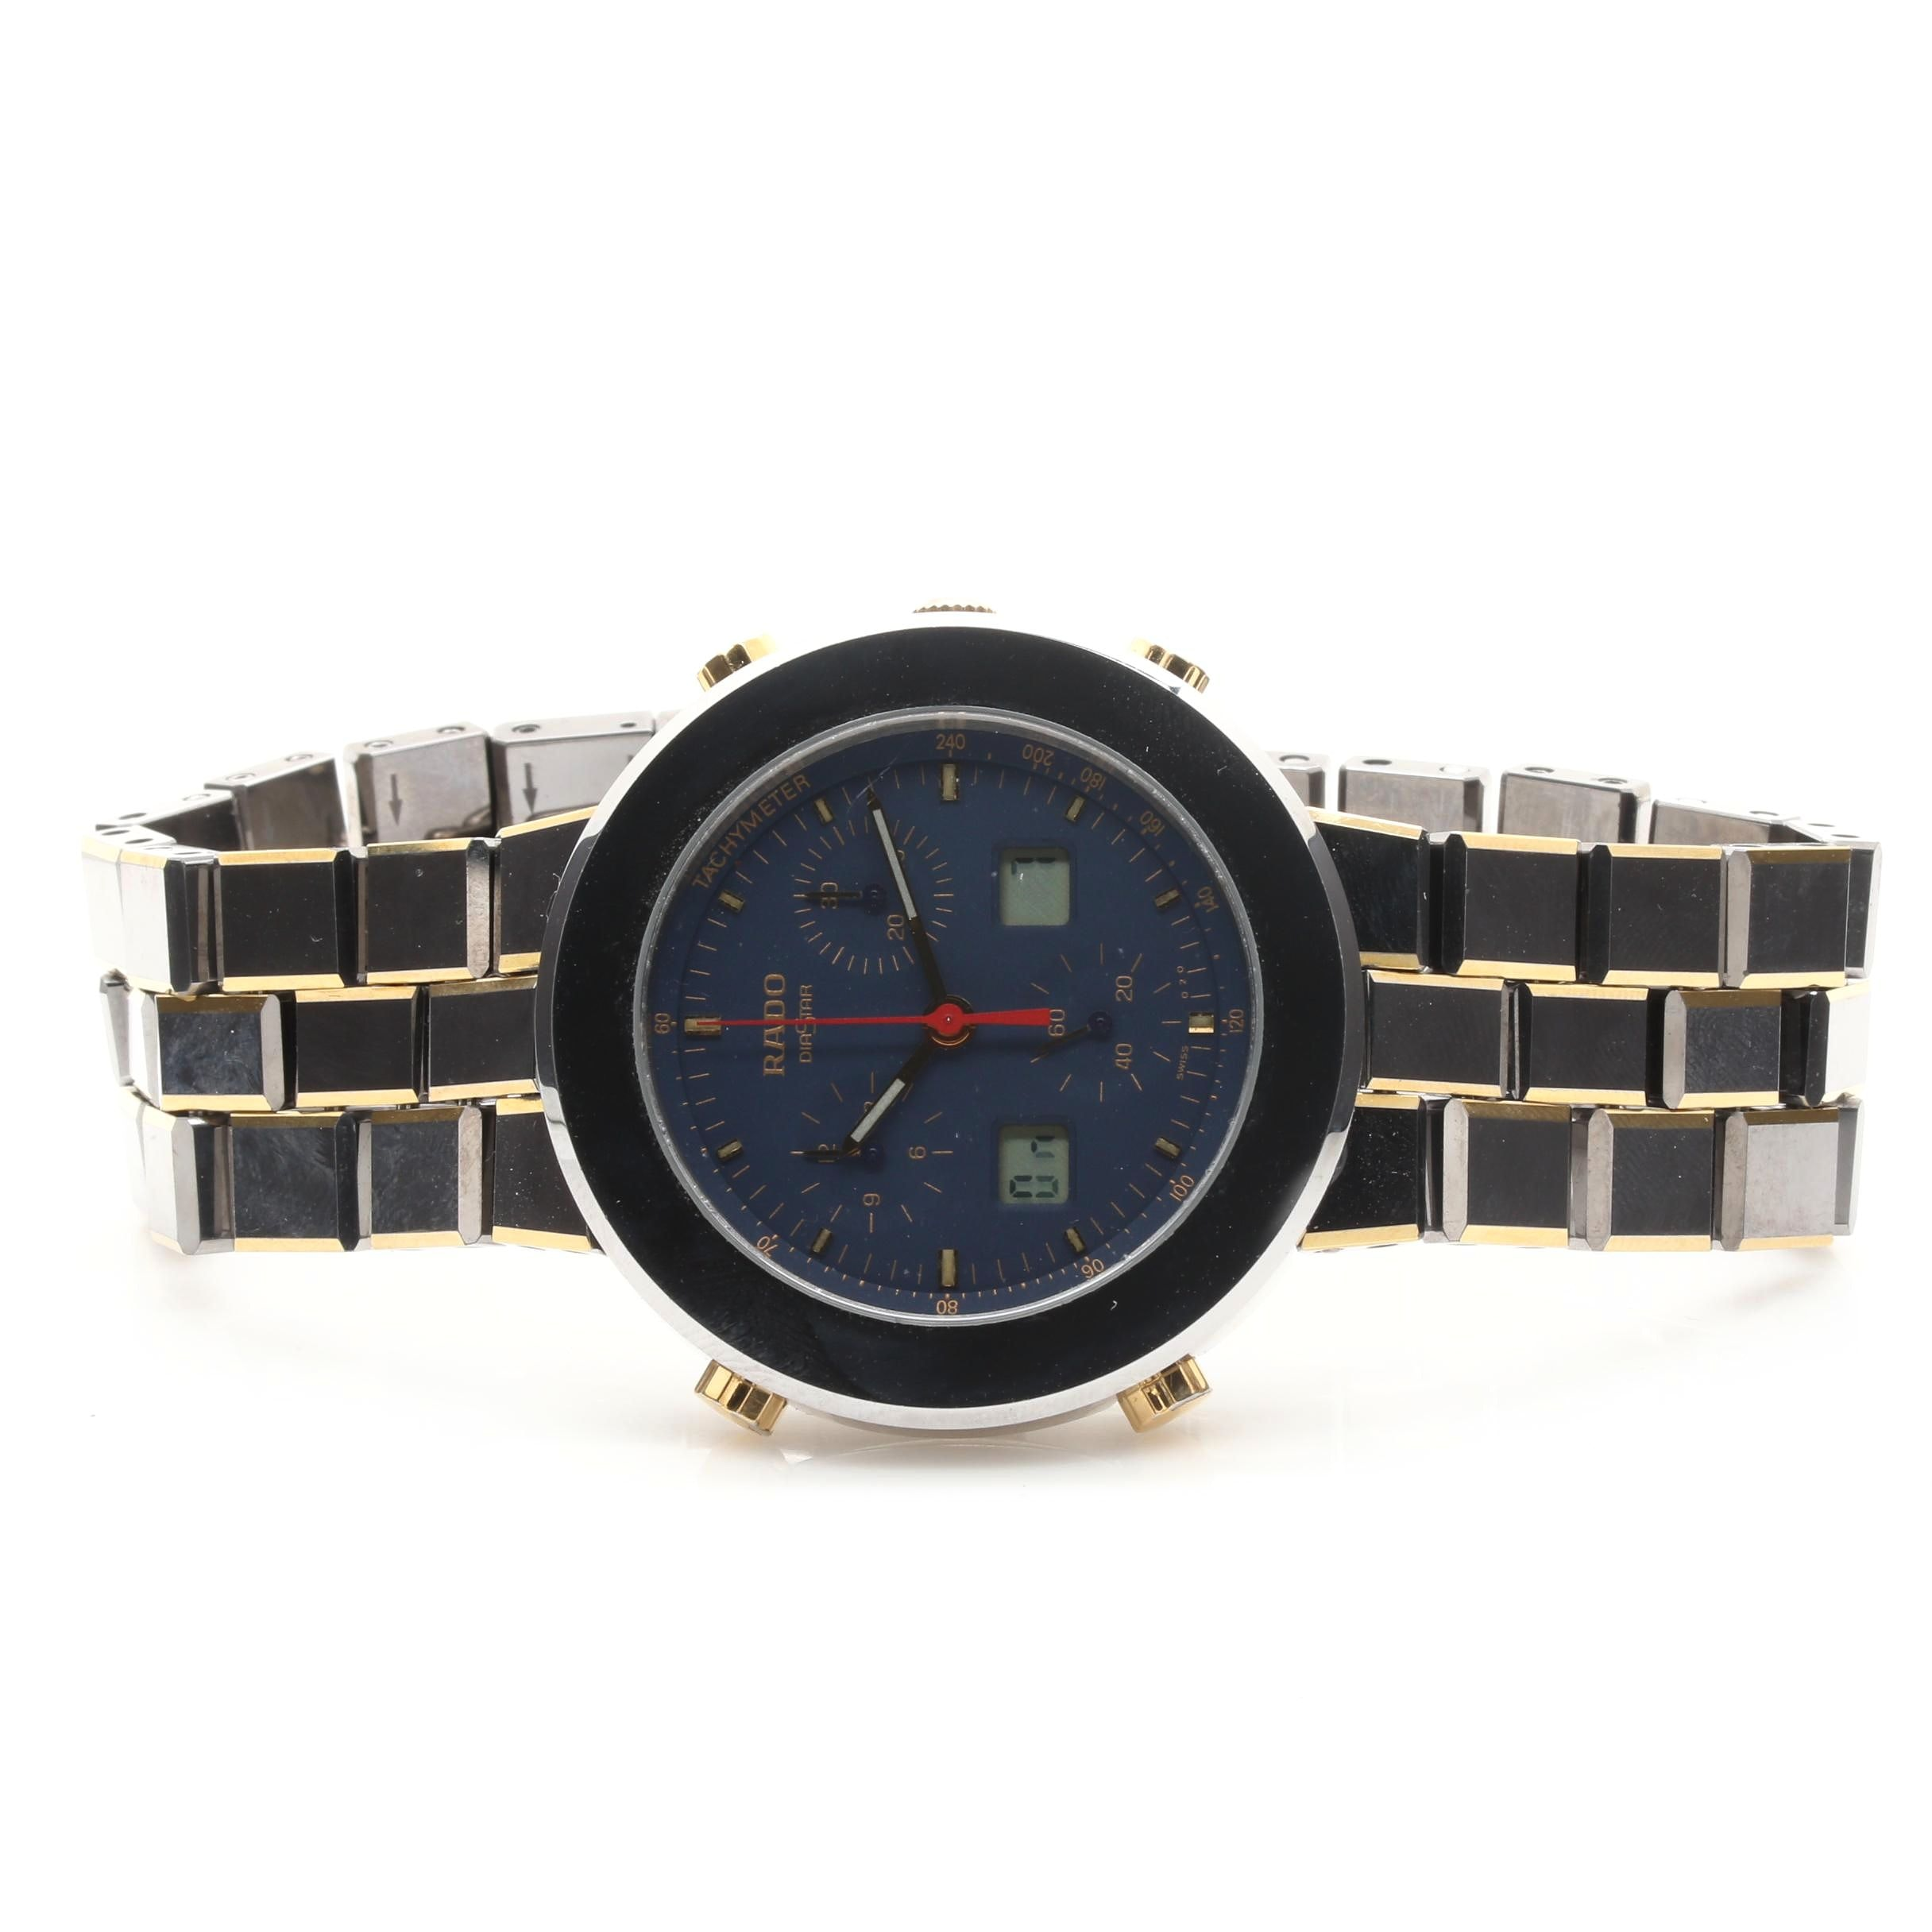 Metallic Titanium and Steel Rado Chronograph Wristwatch